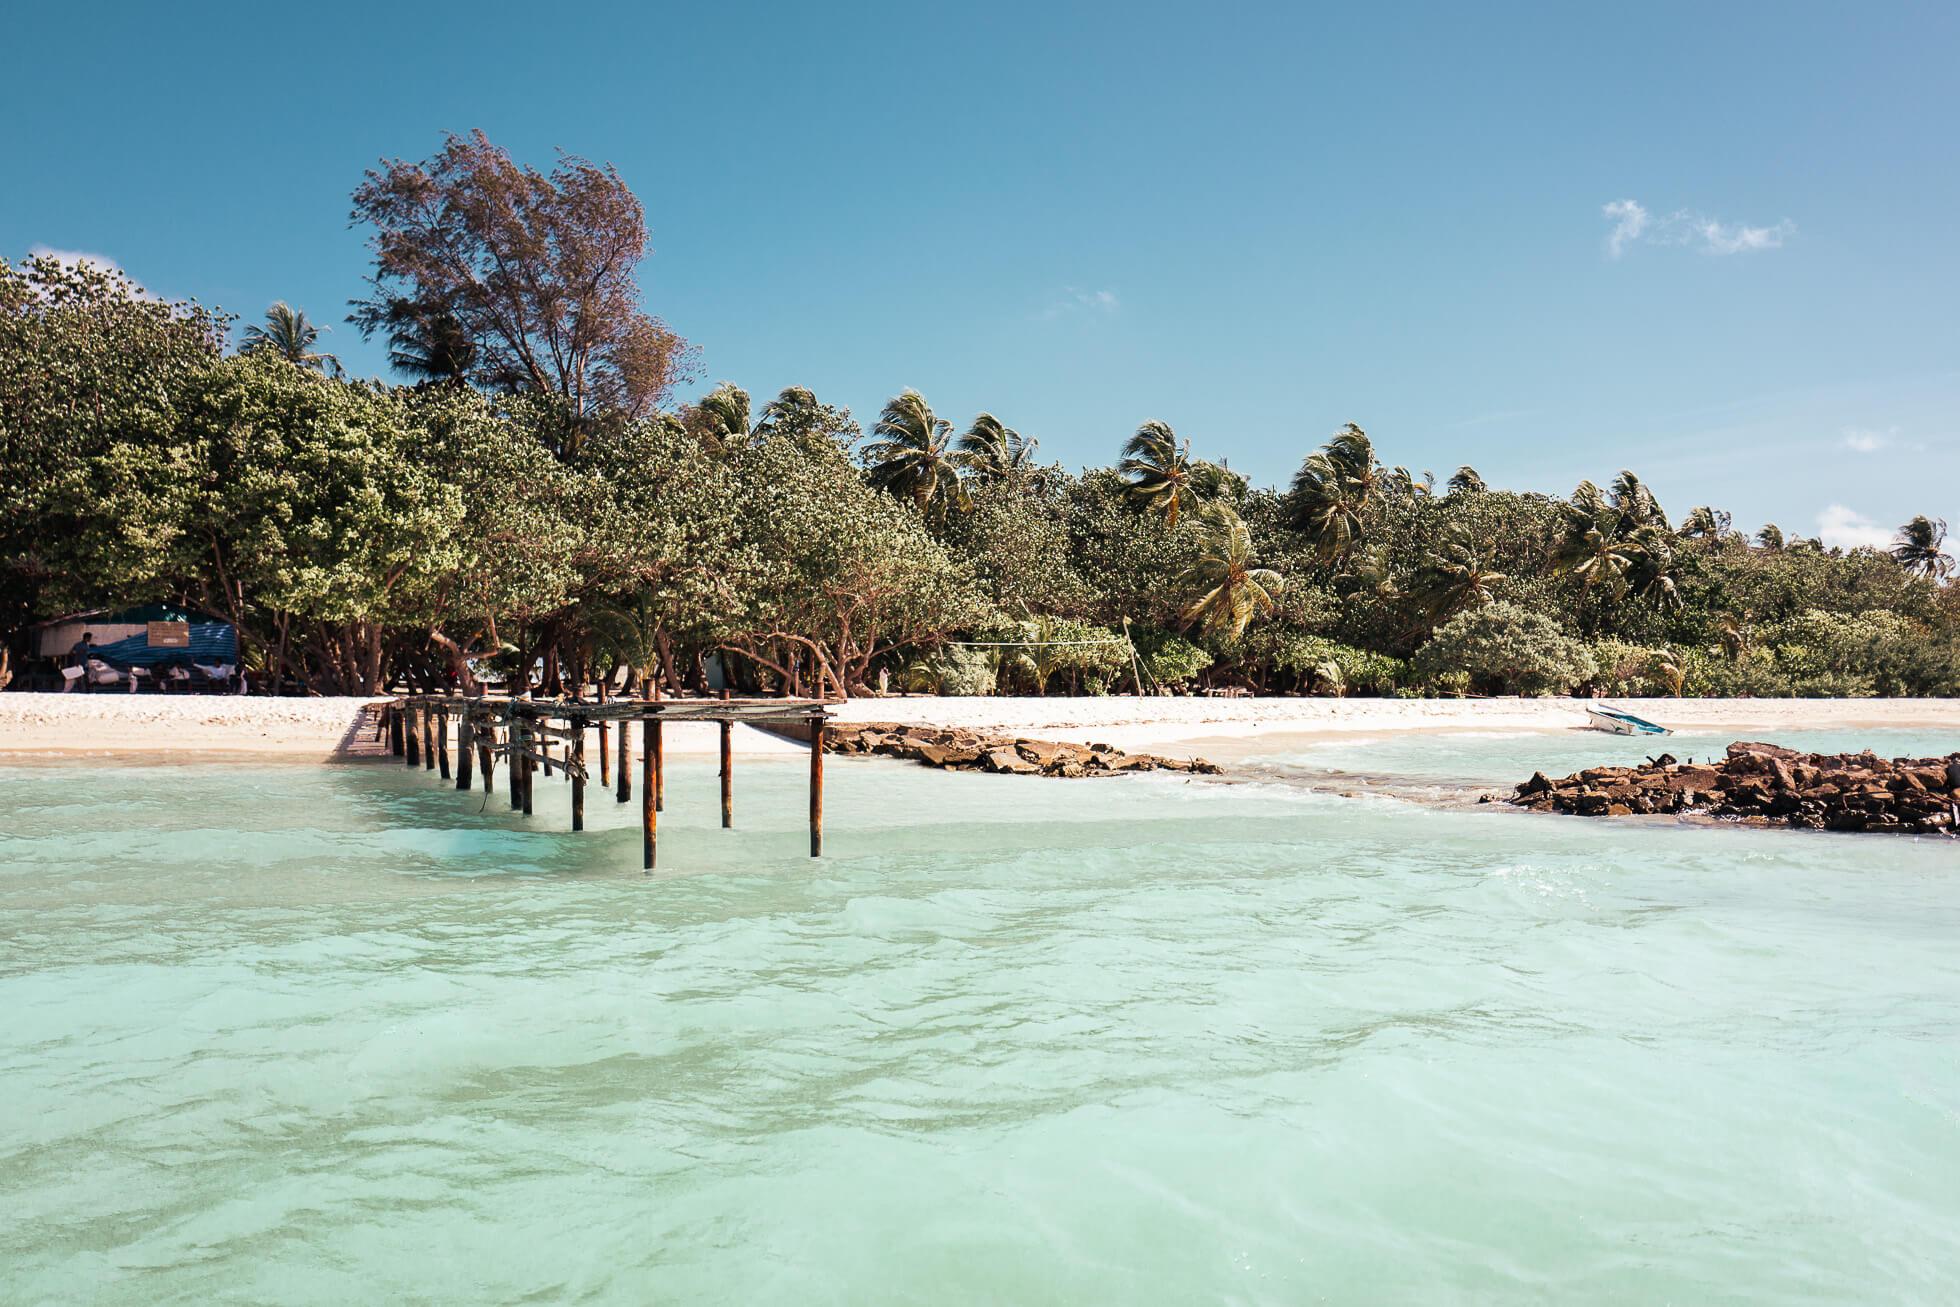 janni-deler-island-hopping-maldivesl1120376